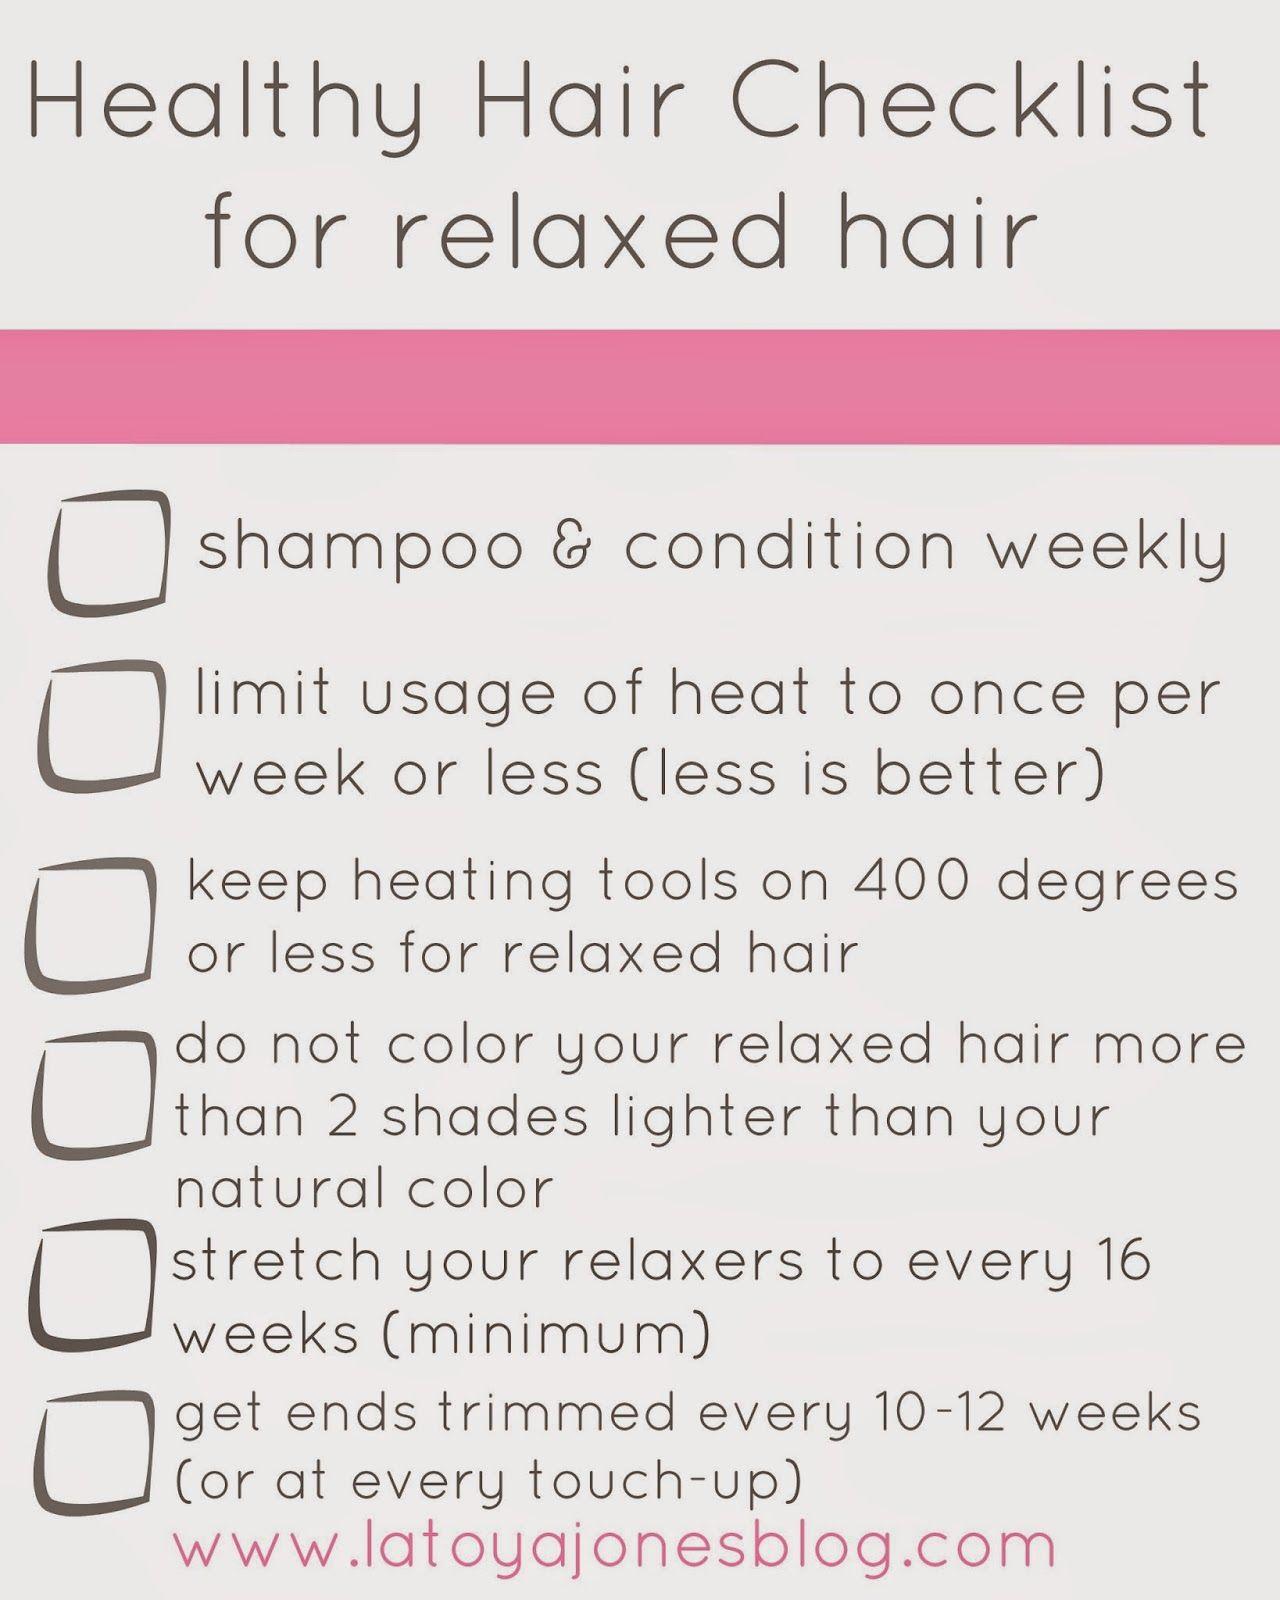 Healthy Hair Checklist (for relaxed hair) Relaxed hair